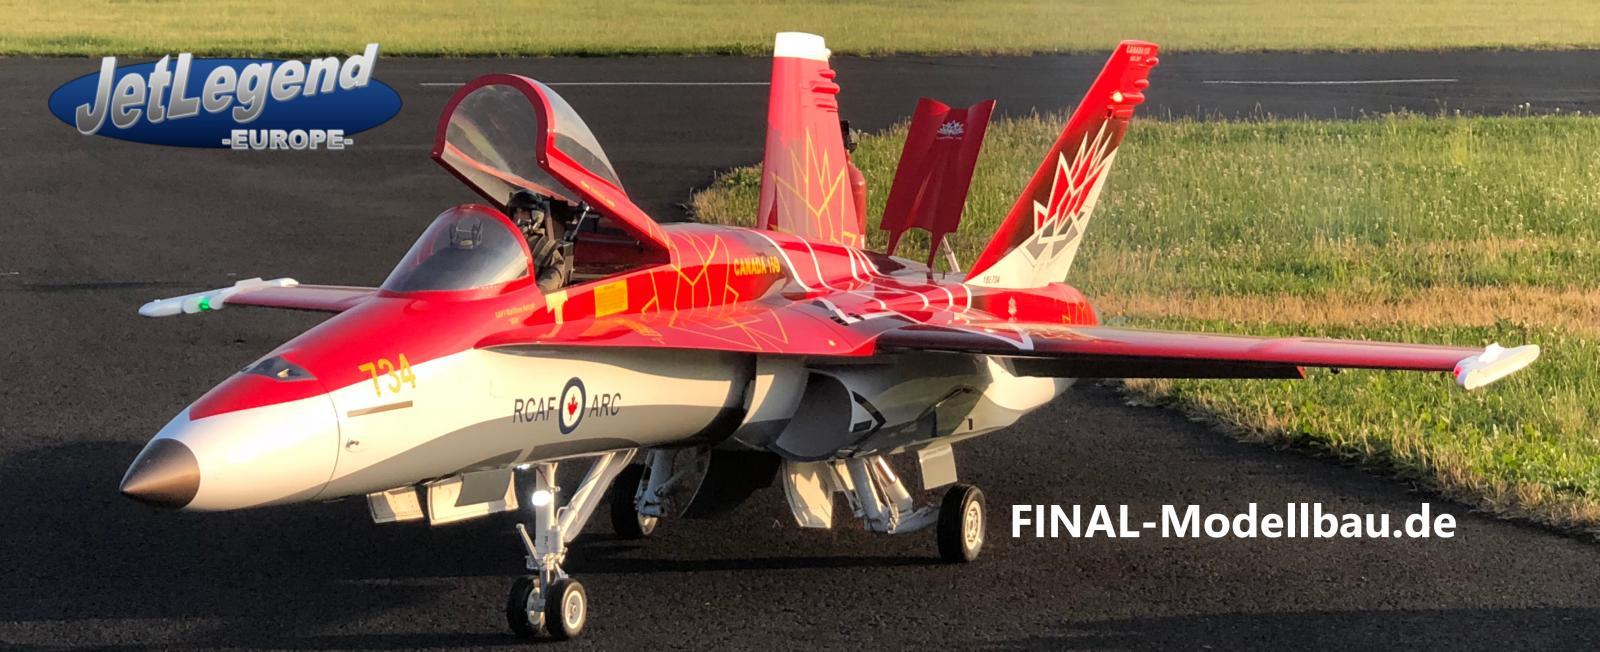 Jetlegend F-18C 1/5.5 PNP Canadian Air Force Display 2017